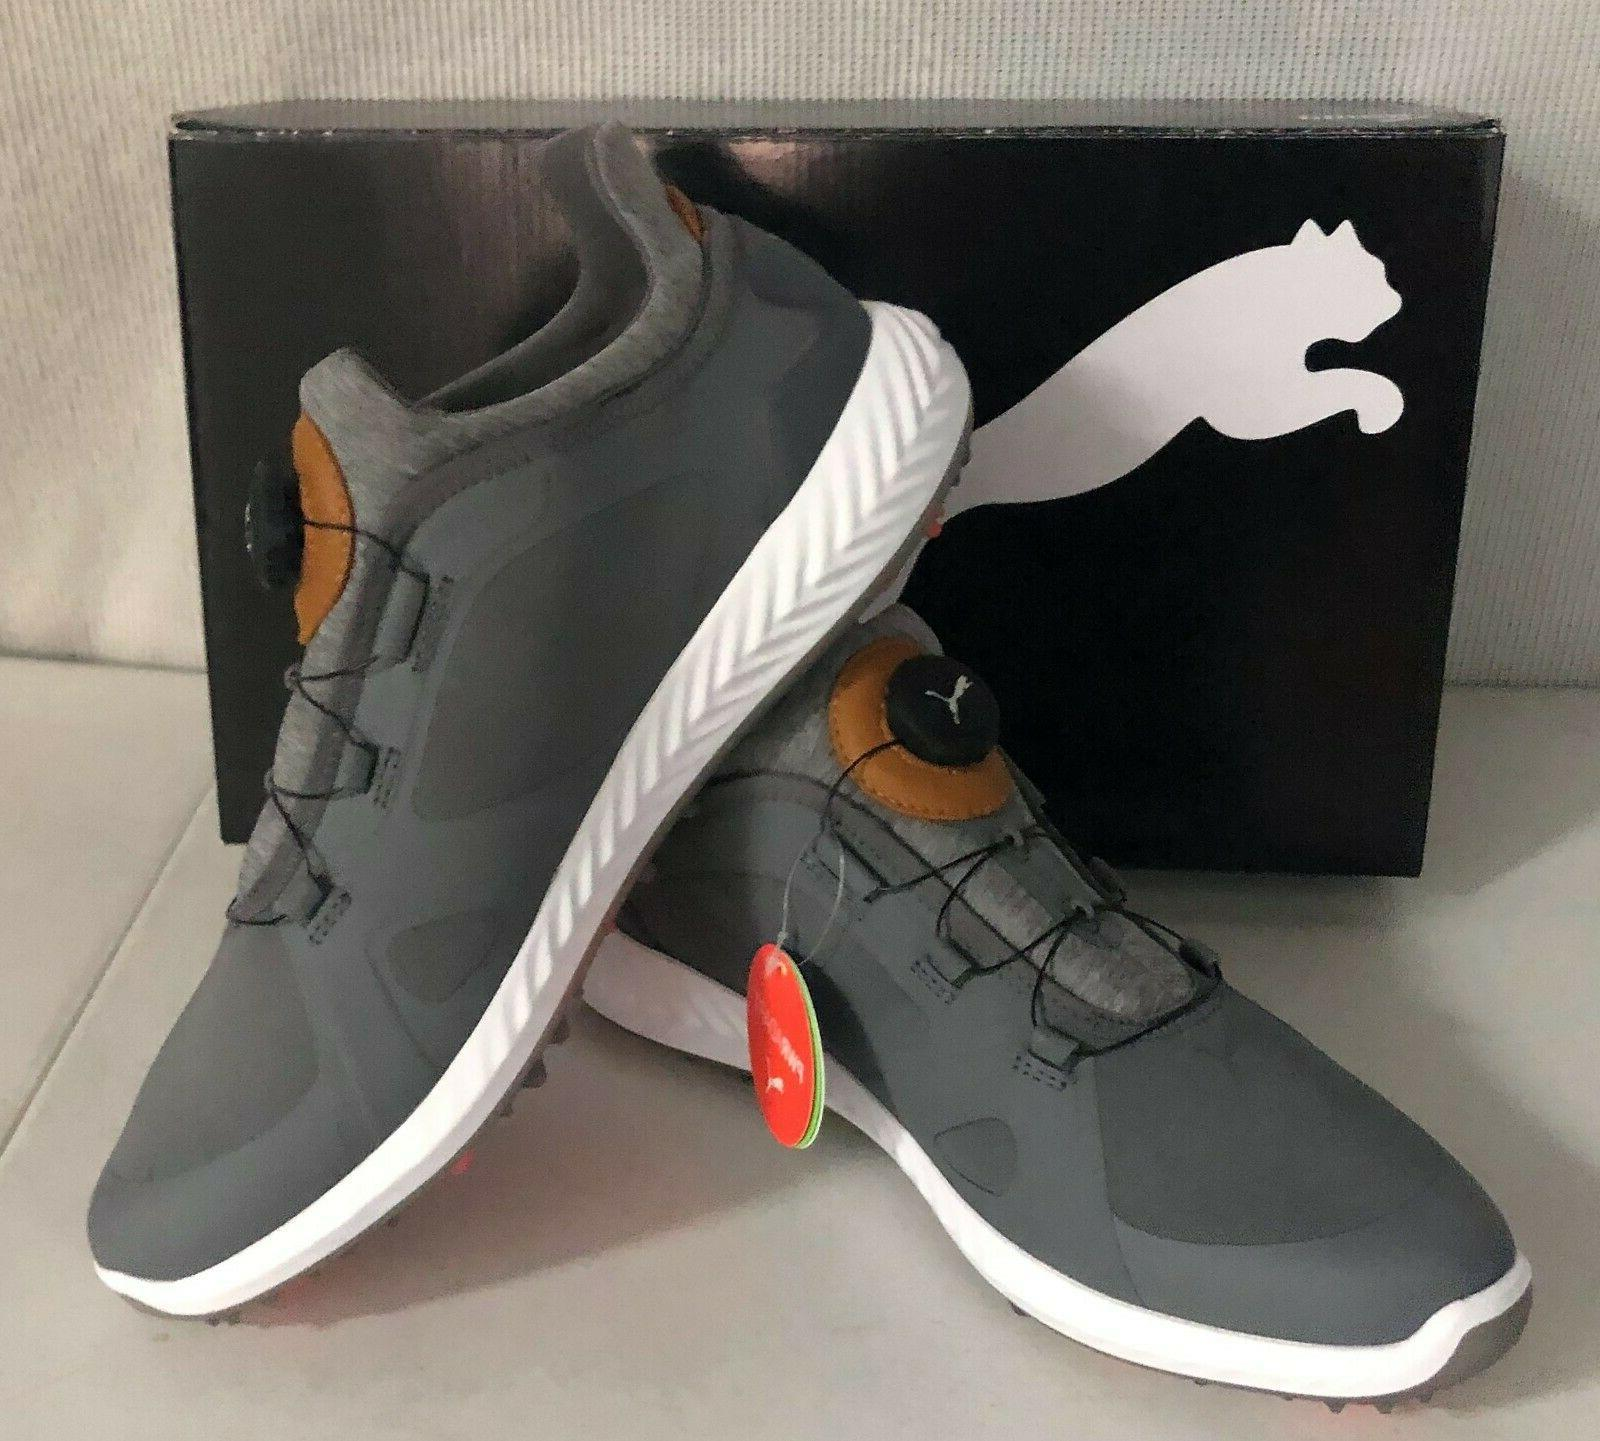 Puma Ignite Mens Golf Shoes - Quiet